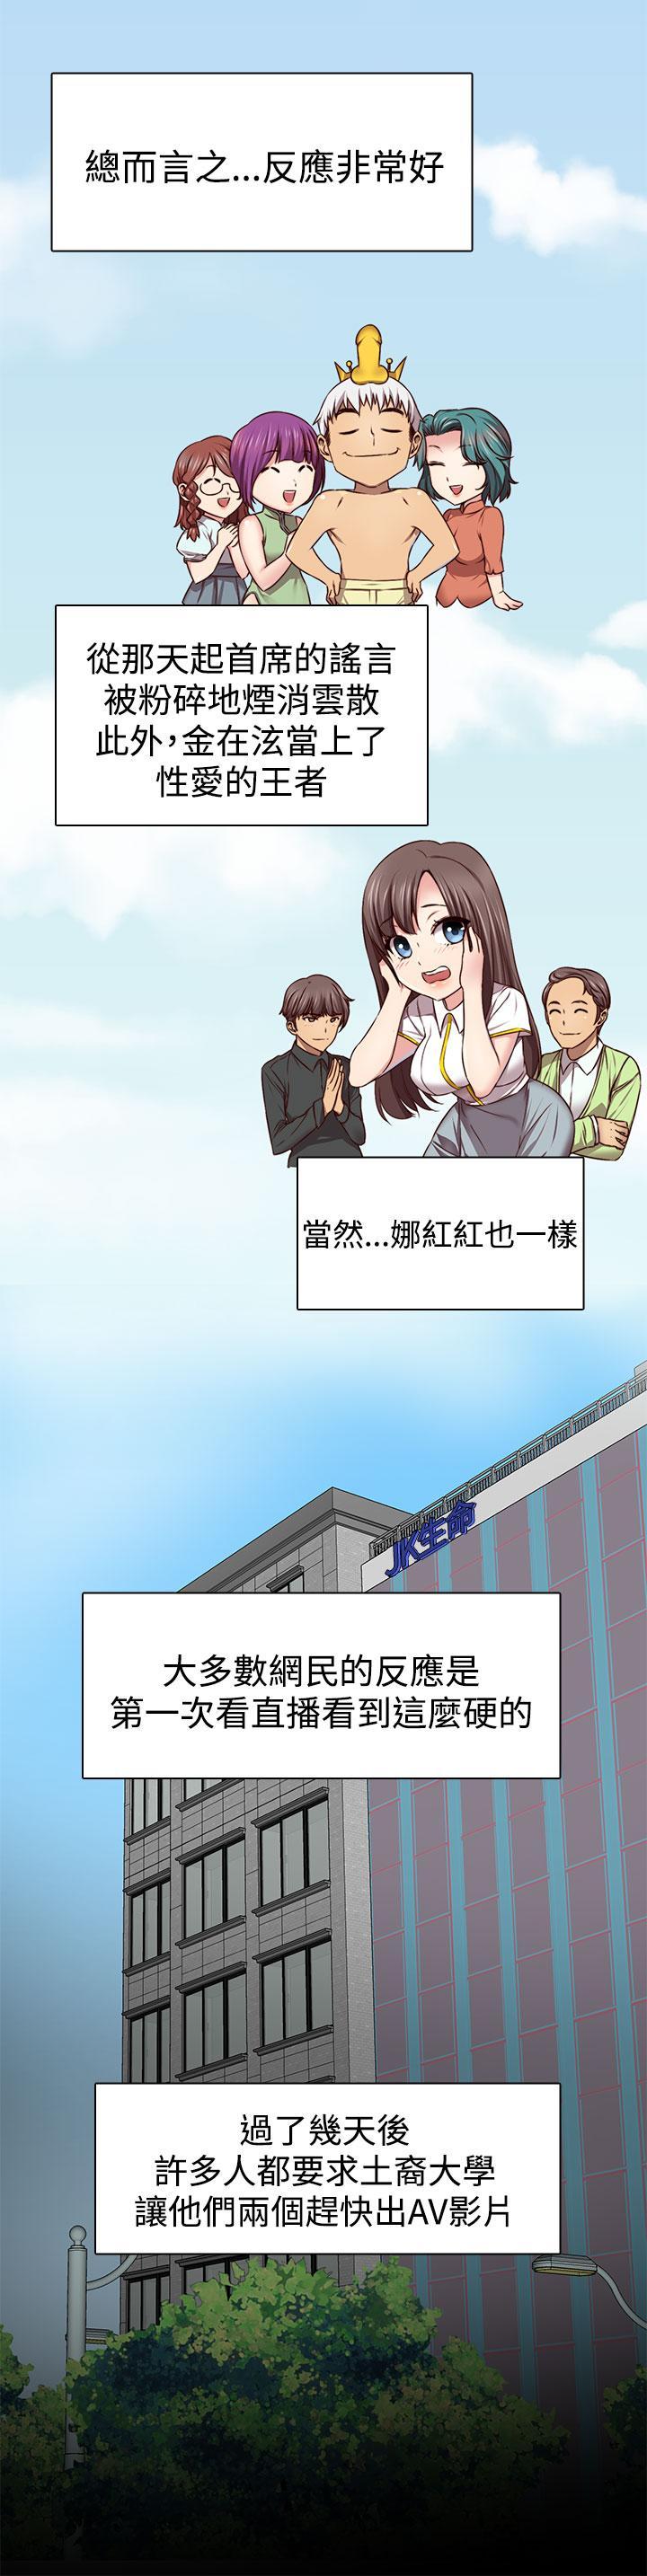 [Dasum & Puutaro] H-Campus H校园<第2季> ch.41-46 (chinese) 103